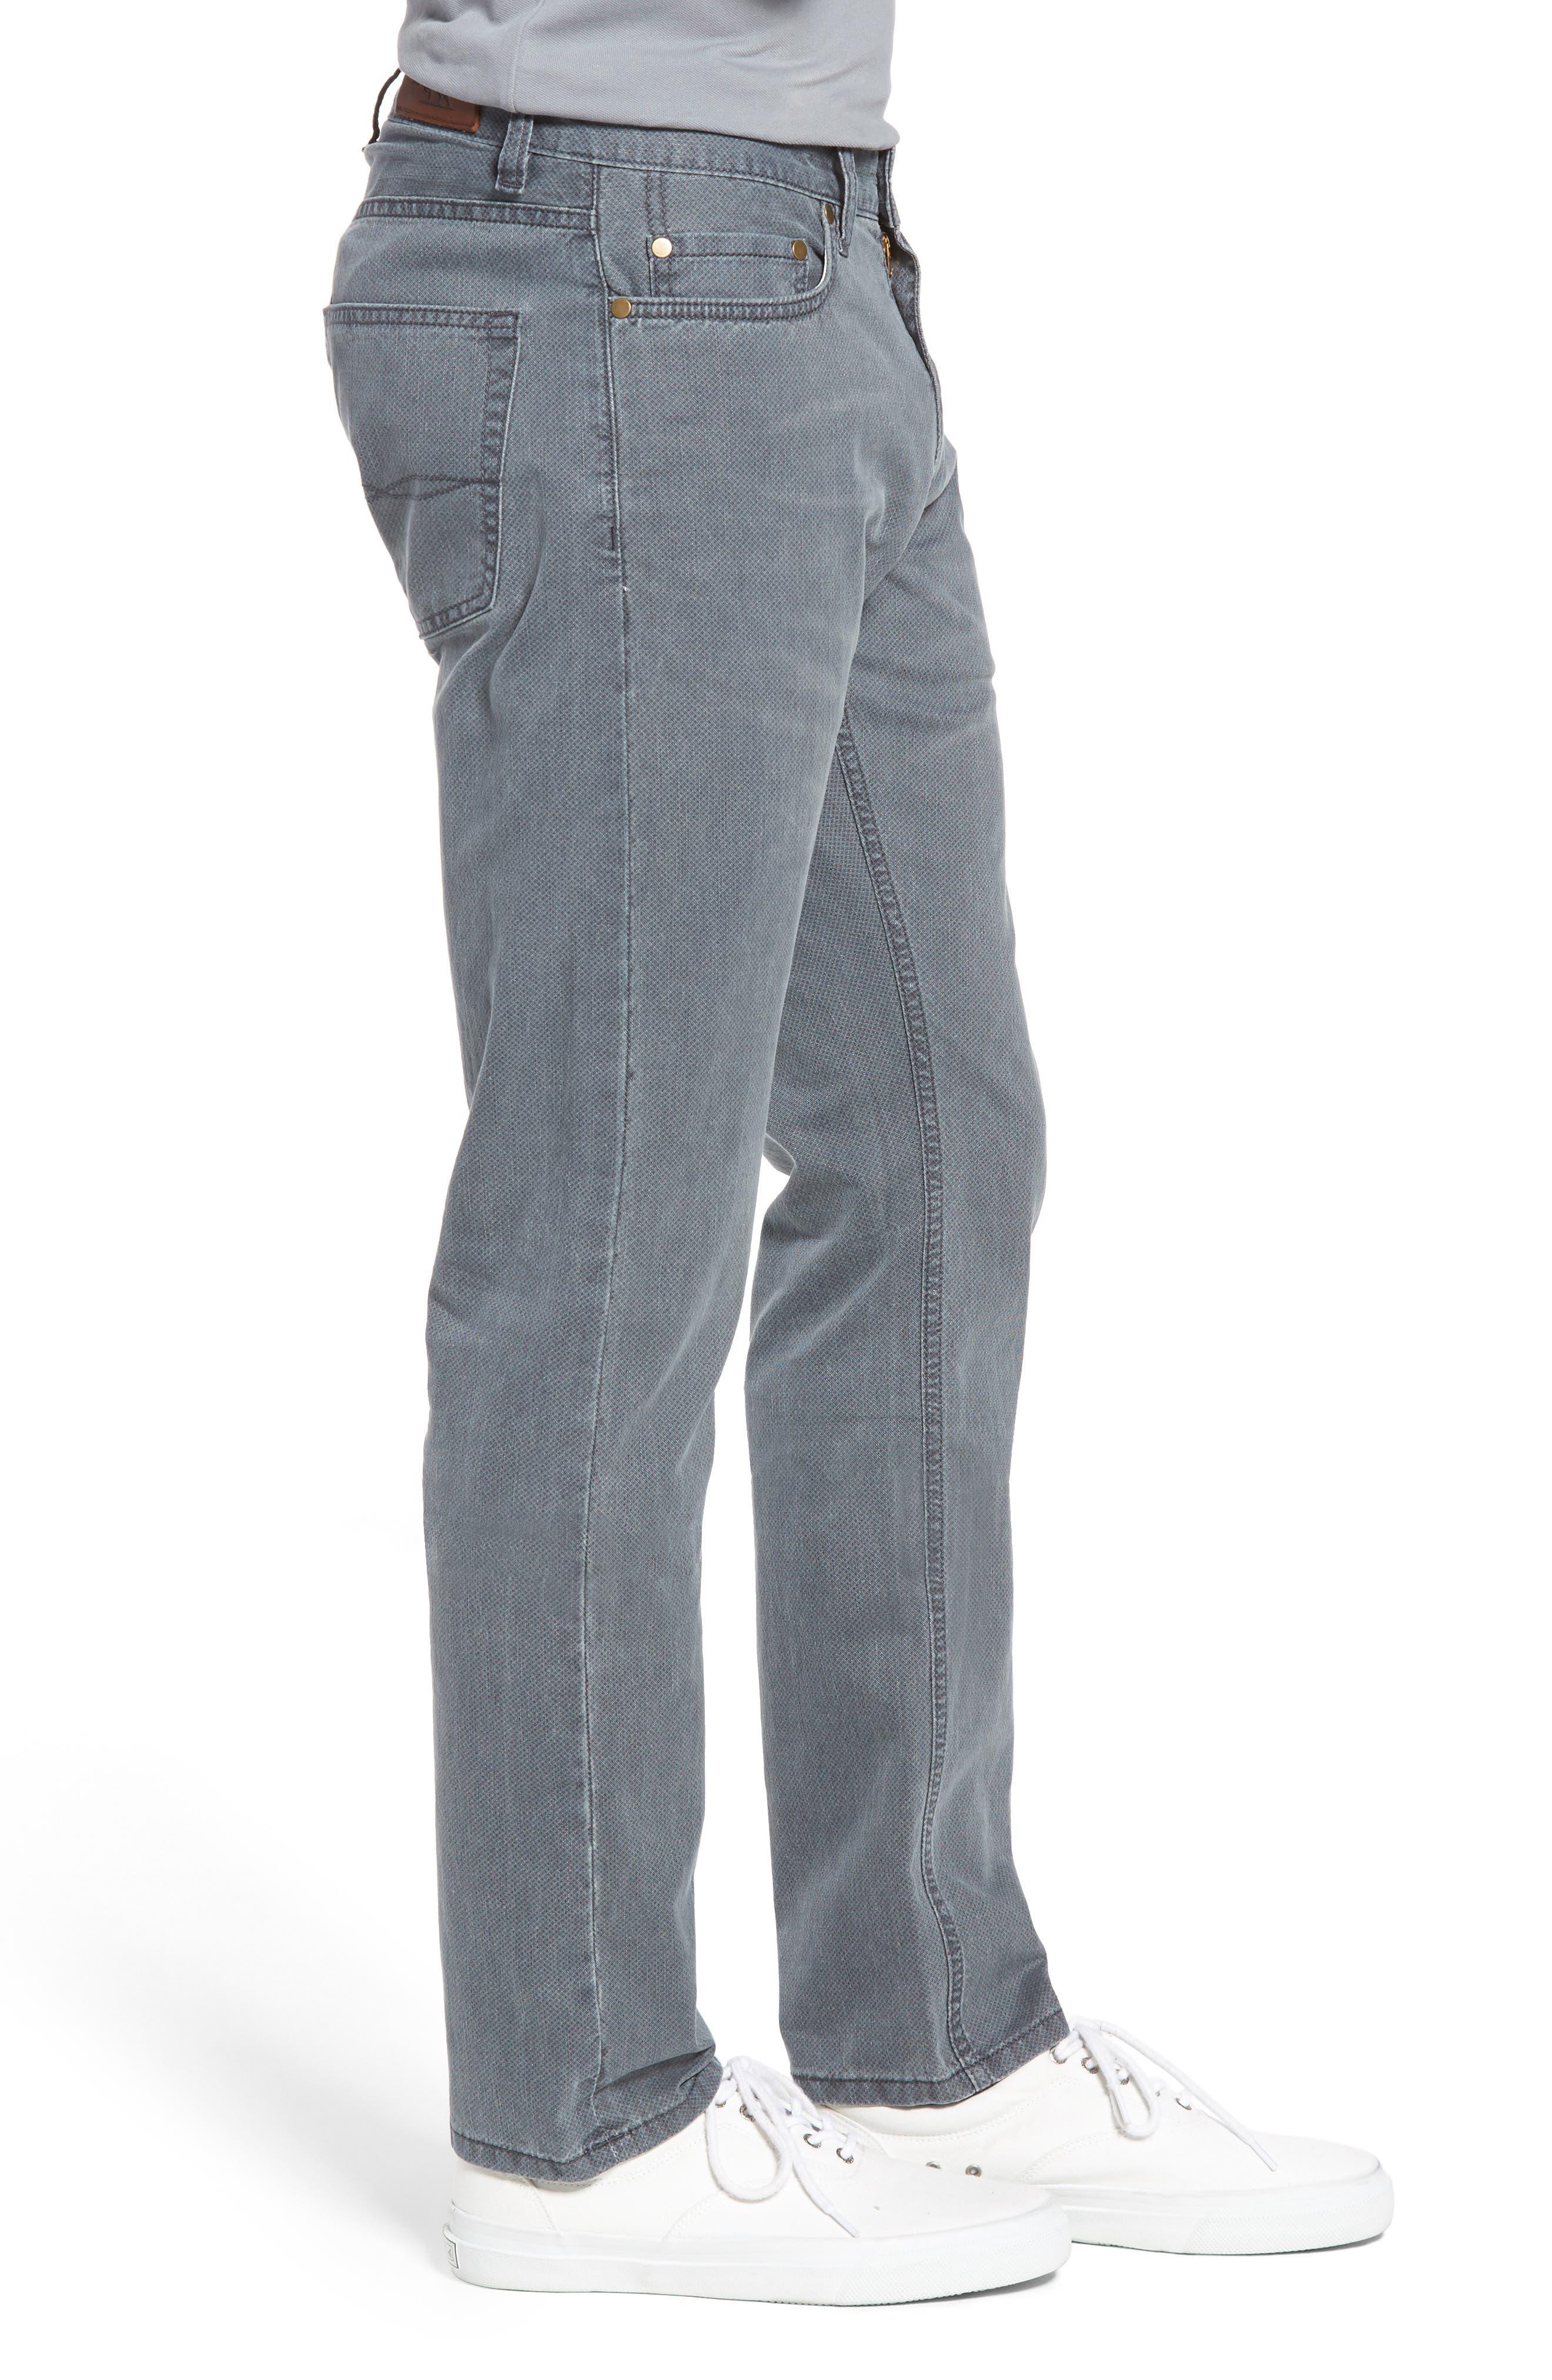 Landsborough Straight Leg Jeans,                             Alternate thumbnail 3, color,                             069